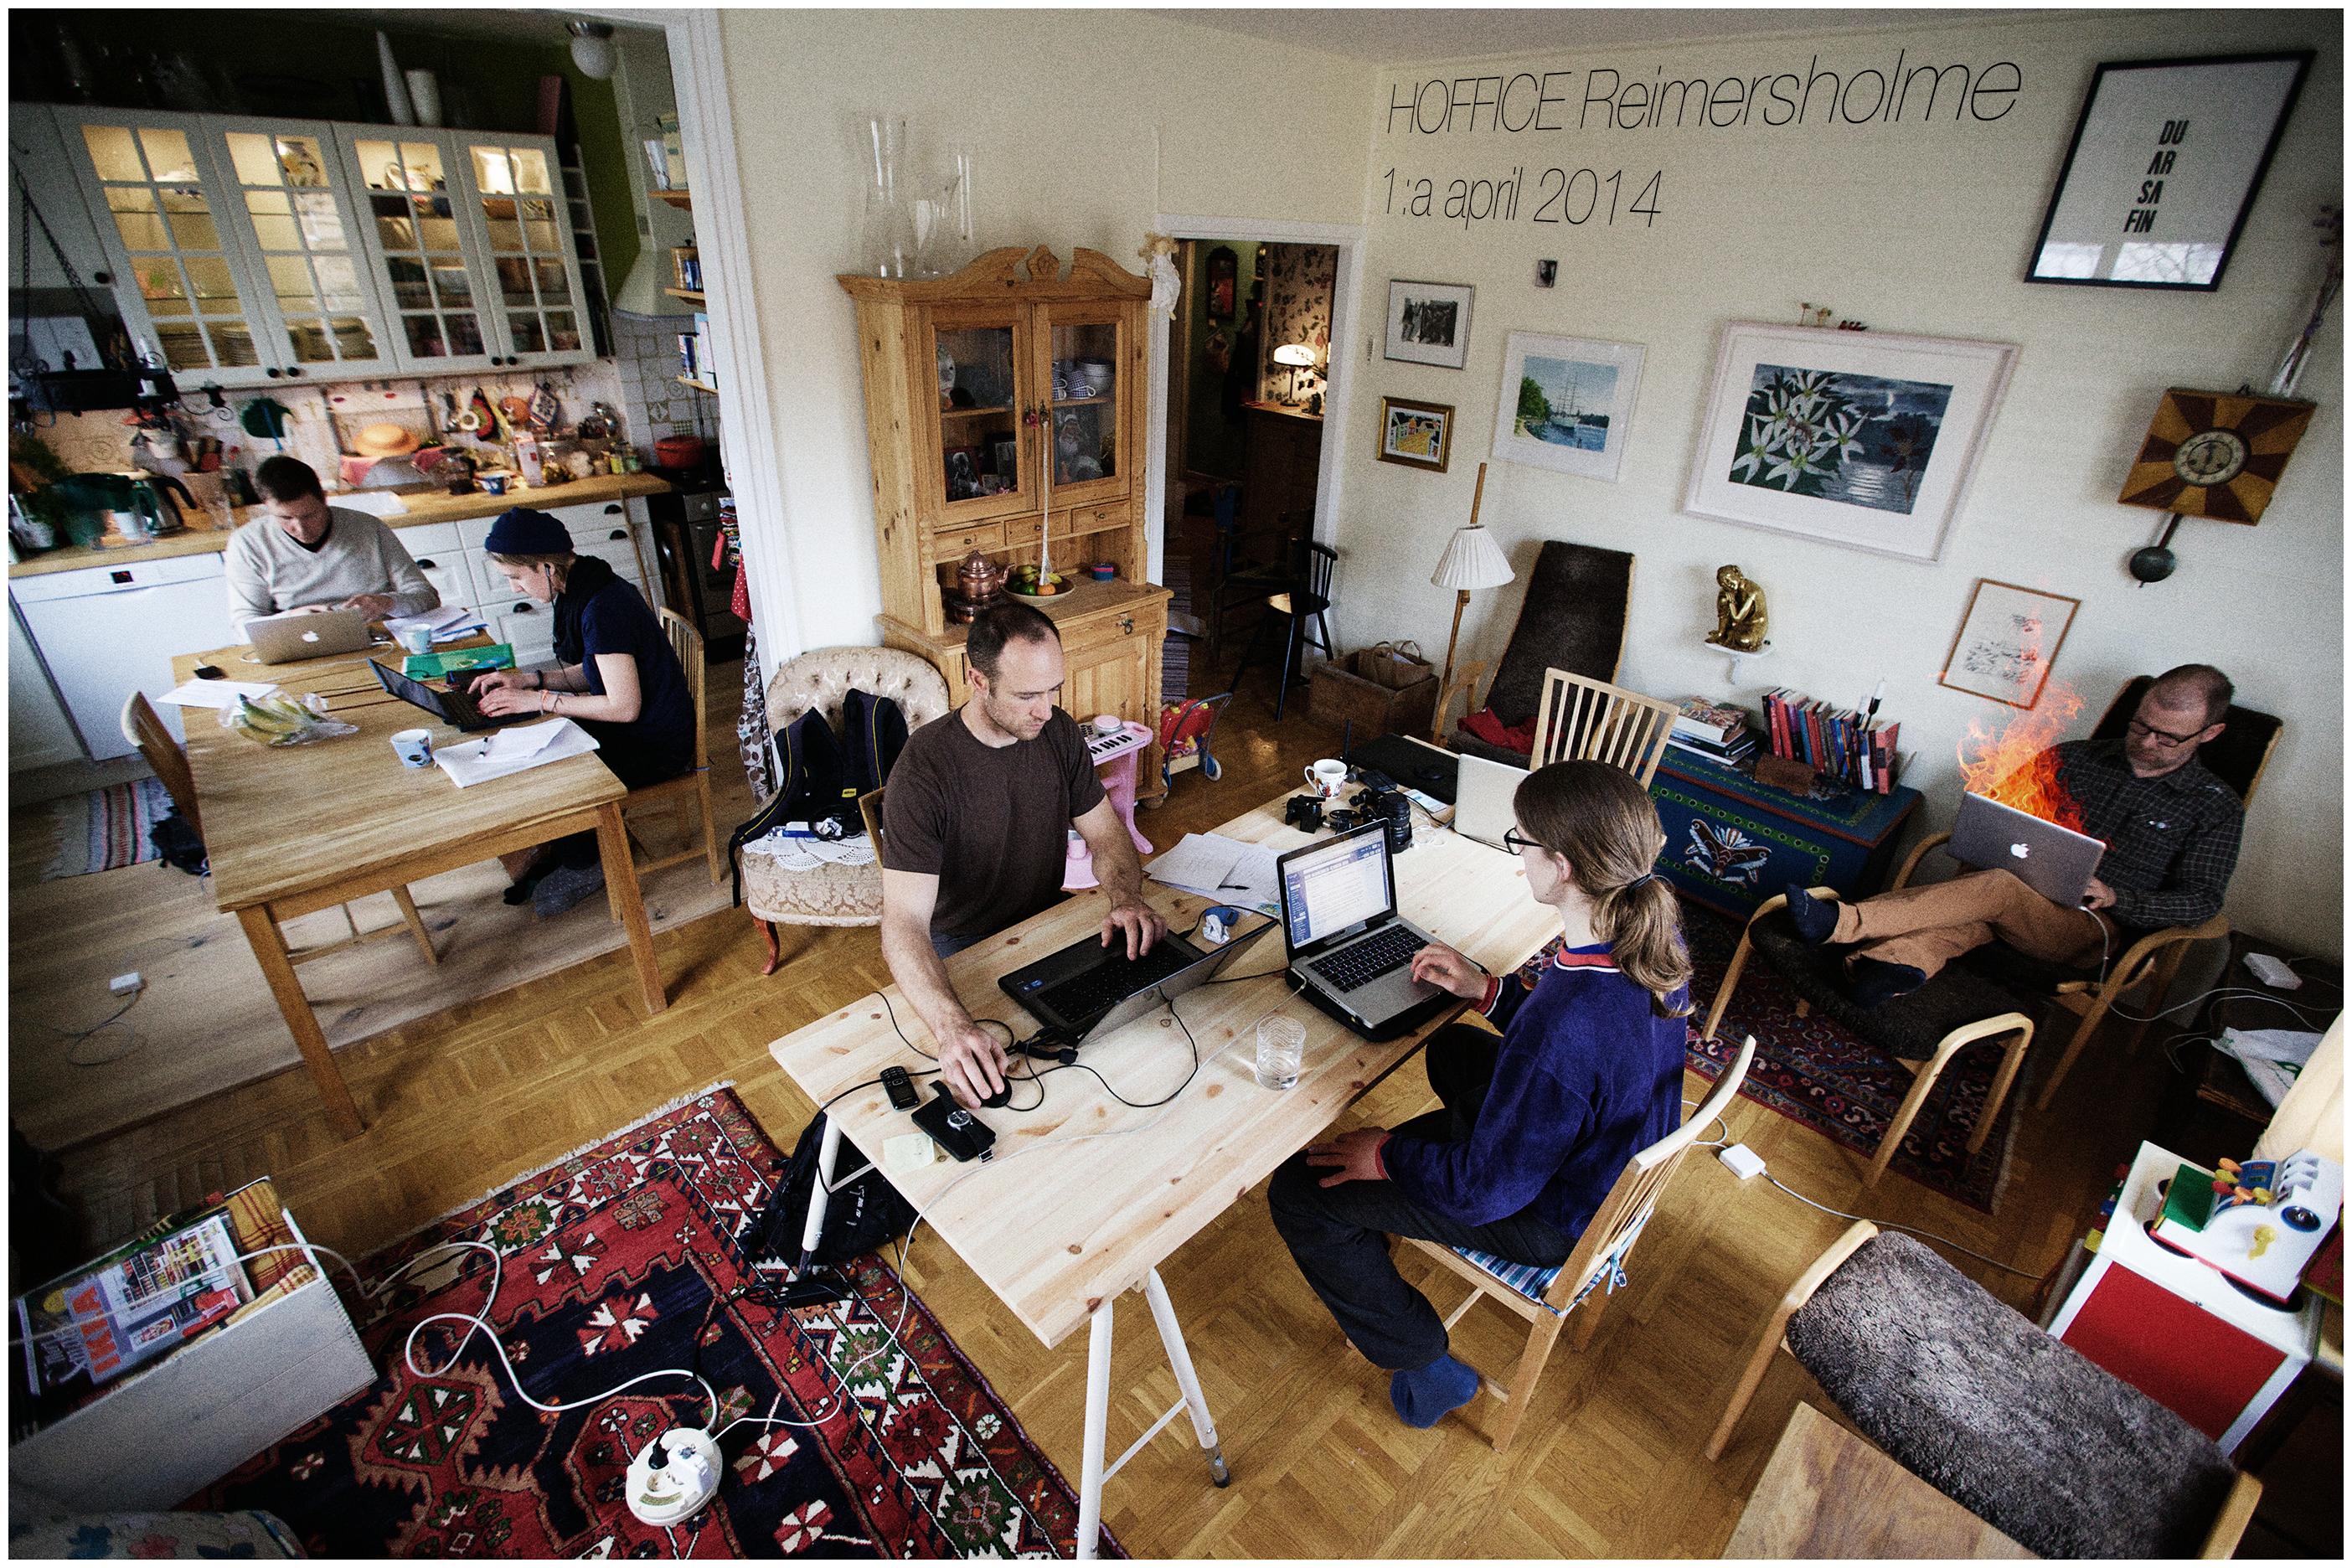 Home + Office = Hoffice!フリーランスに新しい働き方を提案するプラットフォームがスゴイ